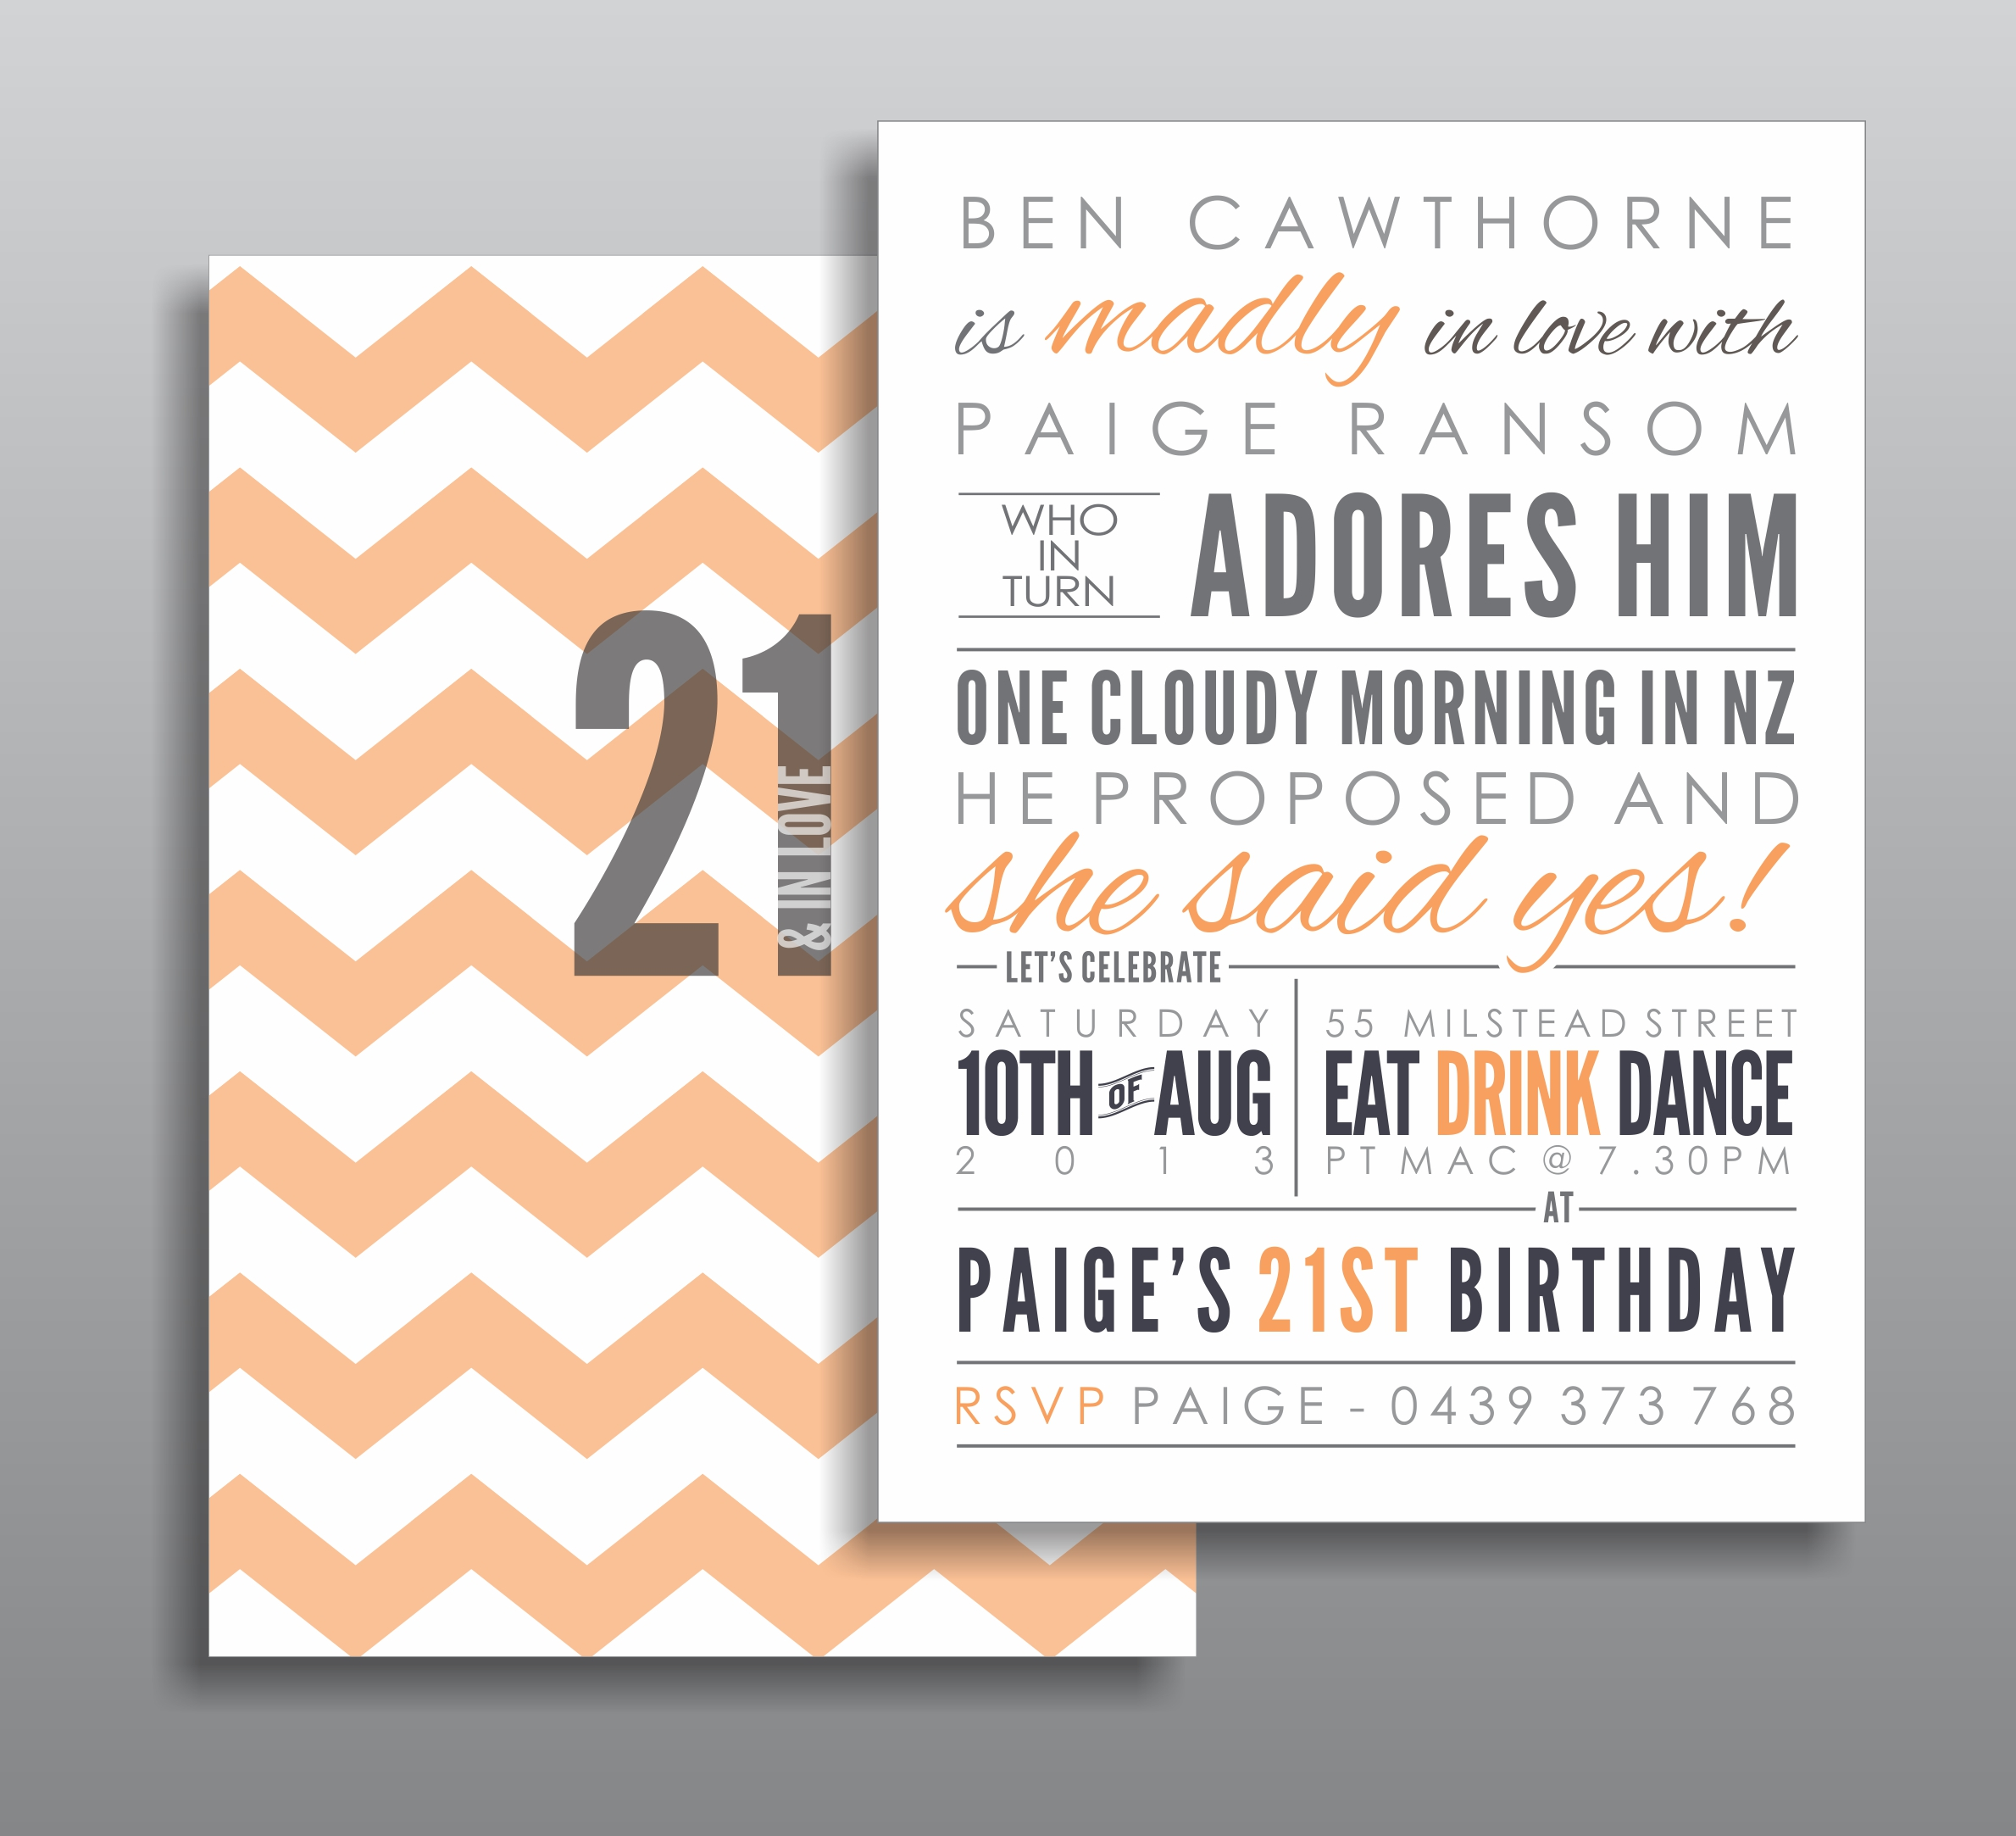 Engagement & Birthday Invitations